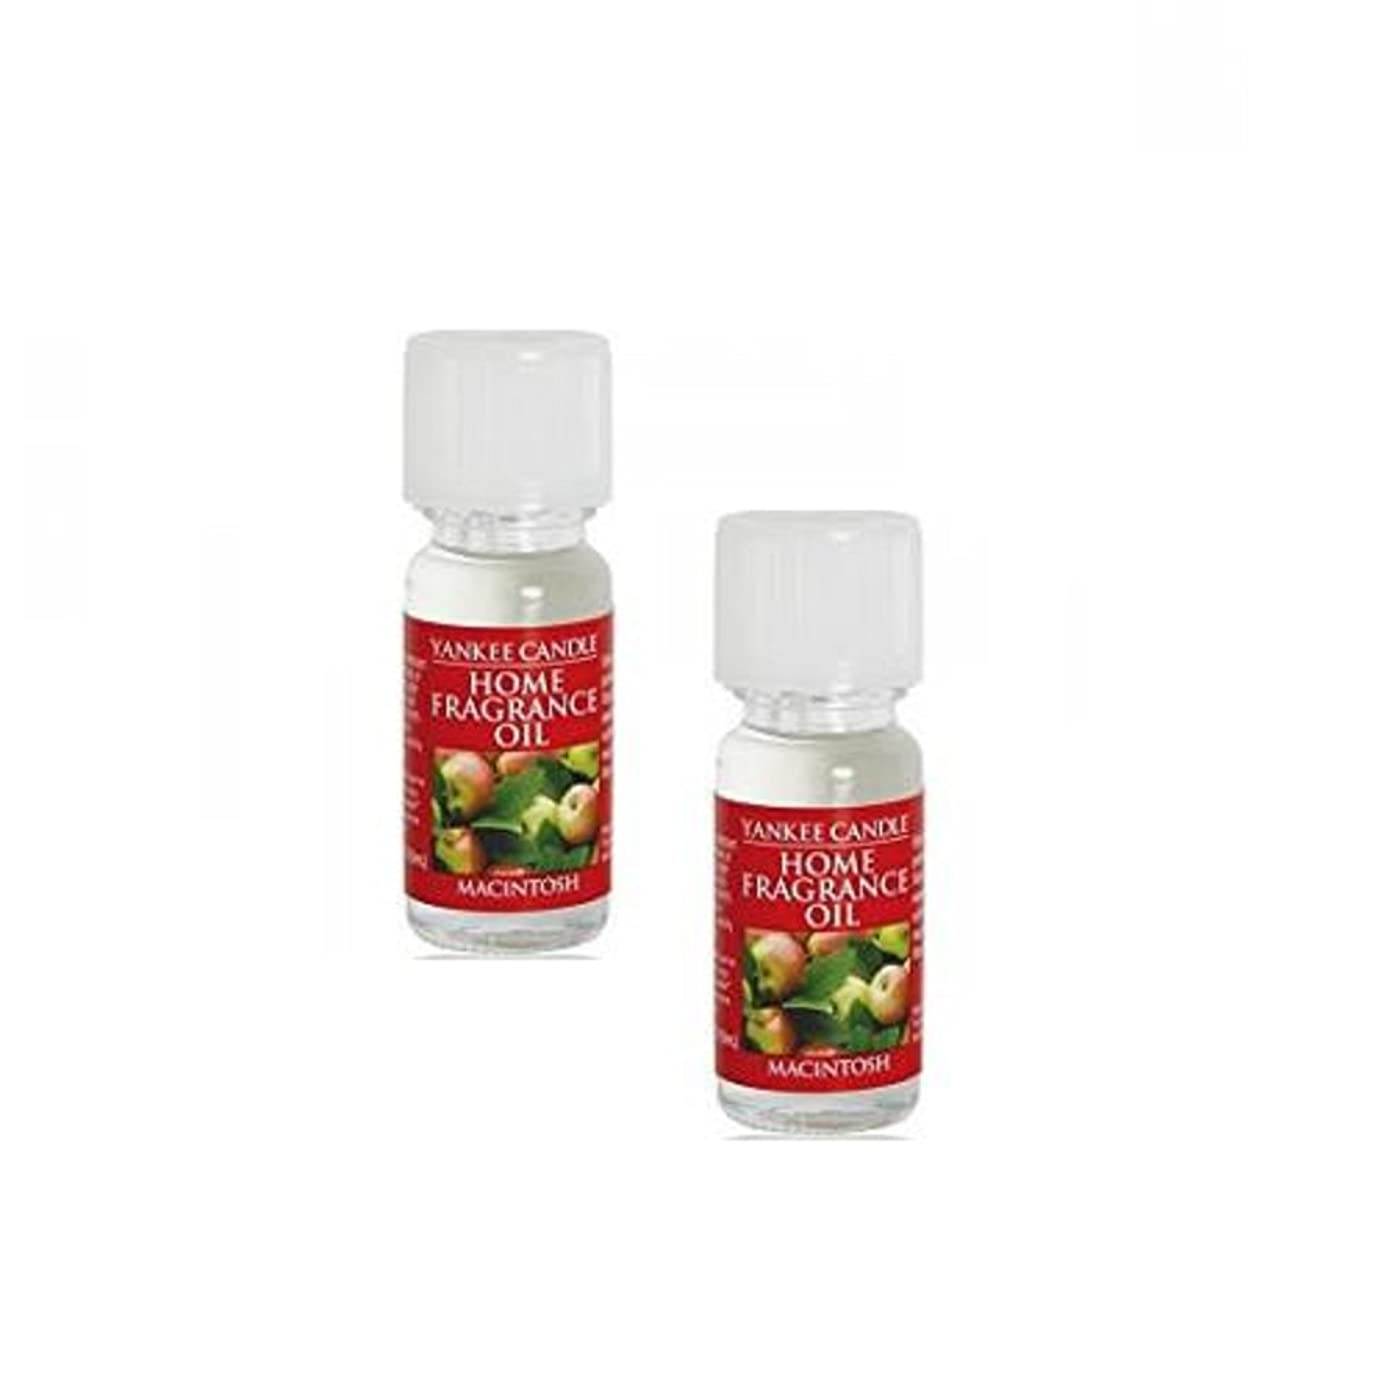 Yankee Candle 2 Pack Macintosh Fragrance Oil .33 Oz.